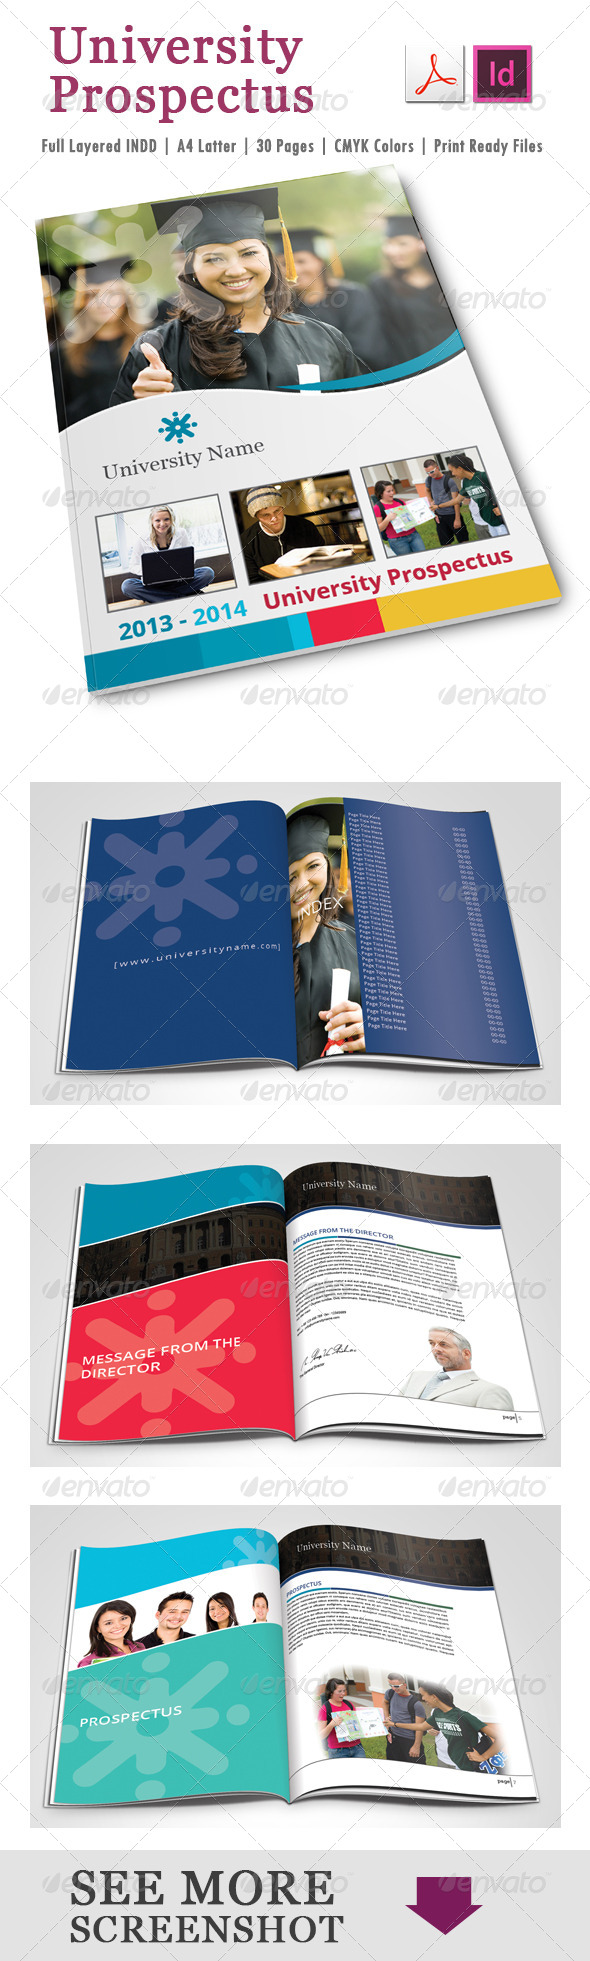 University Prospectus Template - Brochures Print Templates